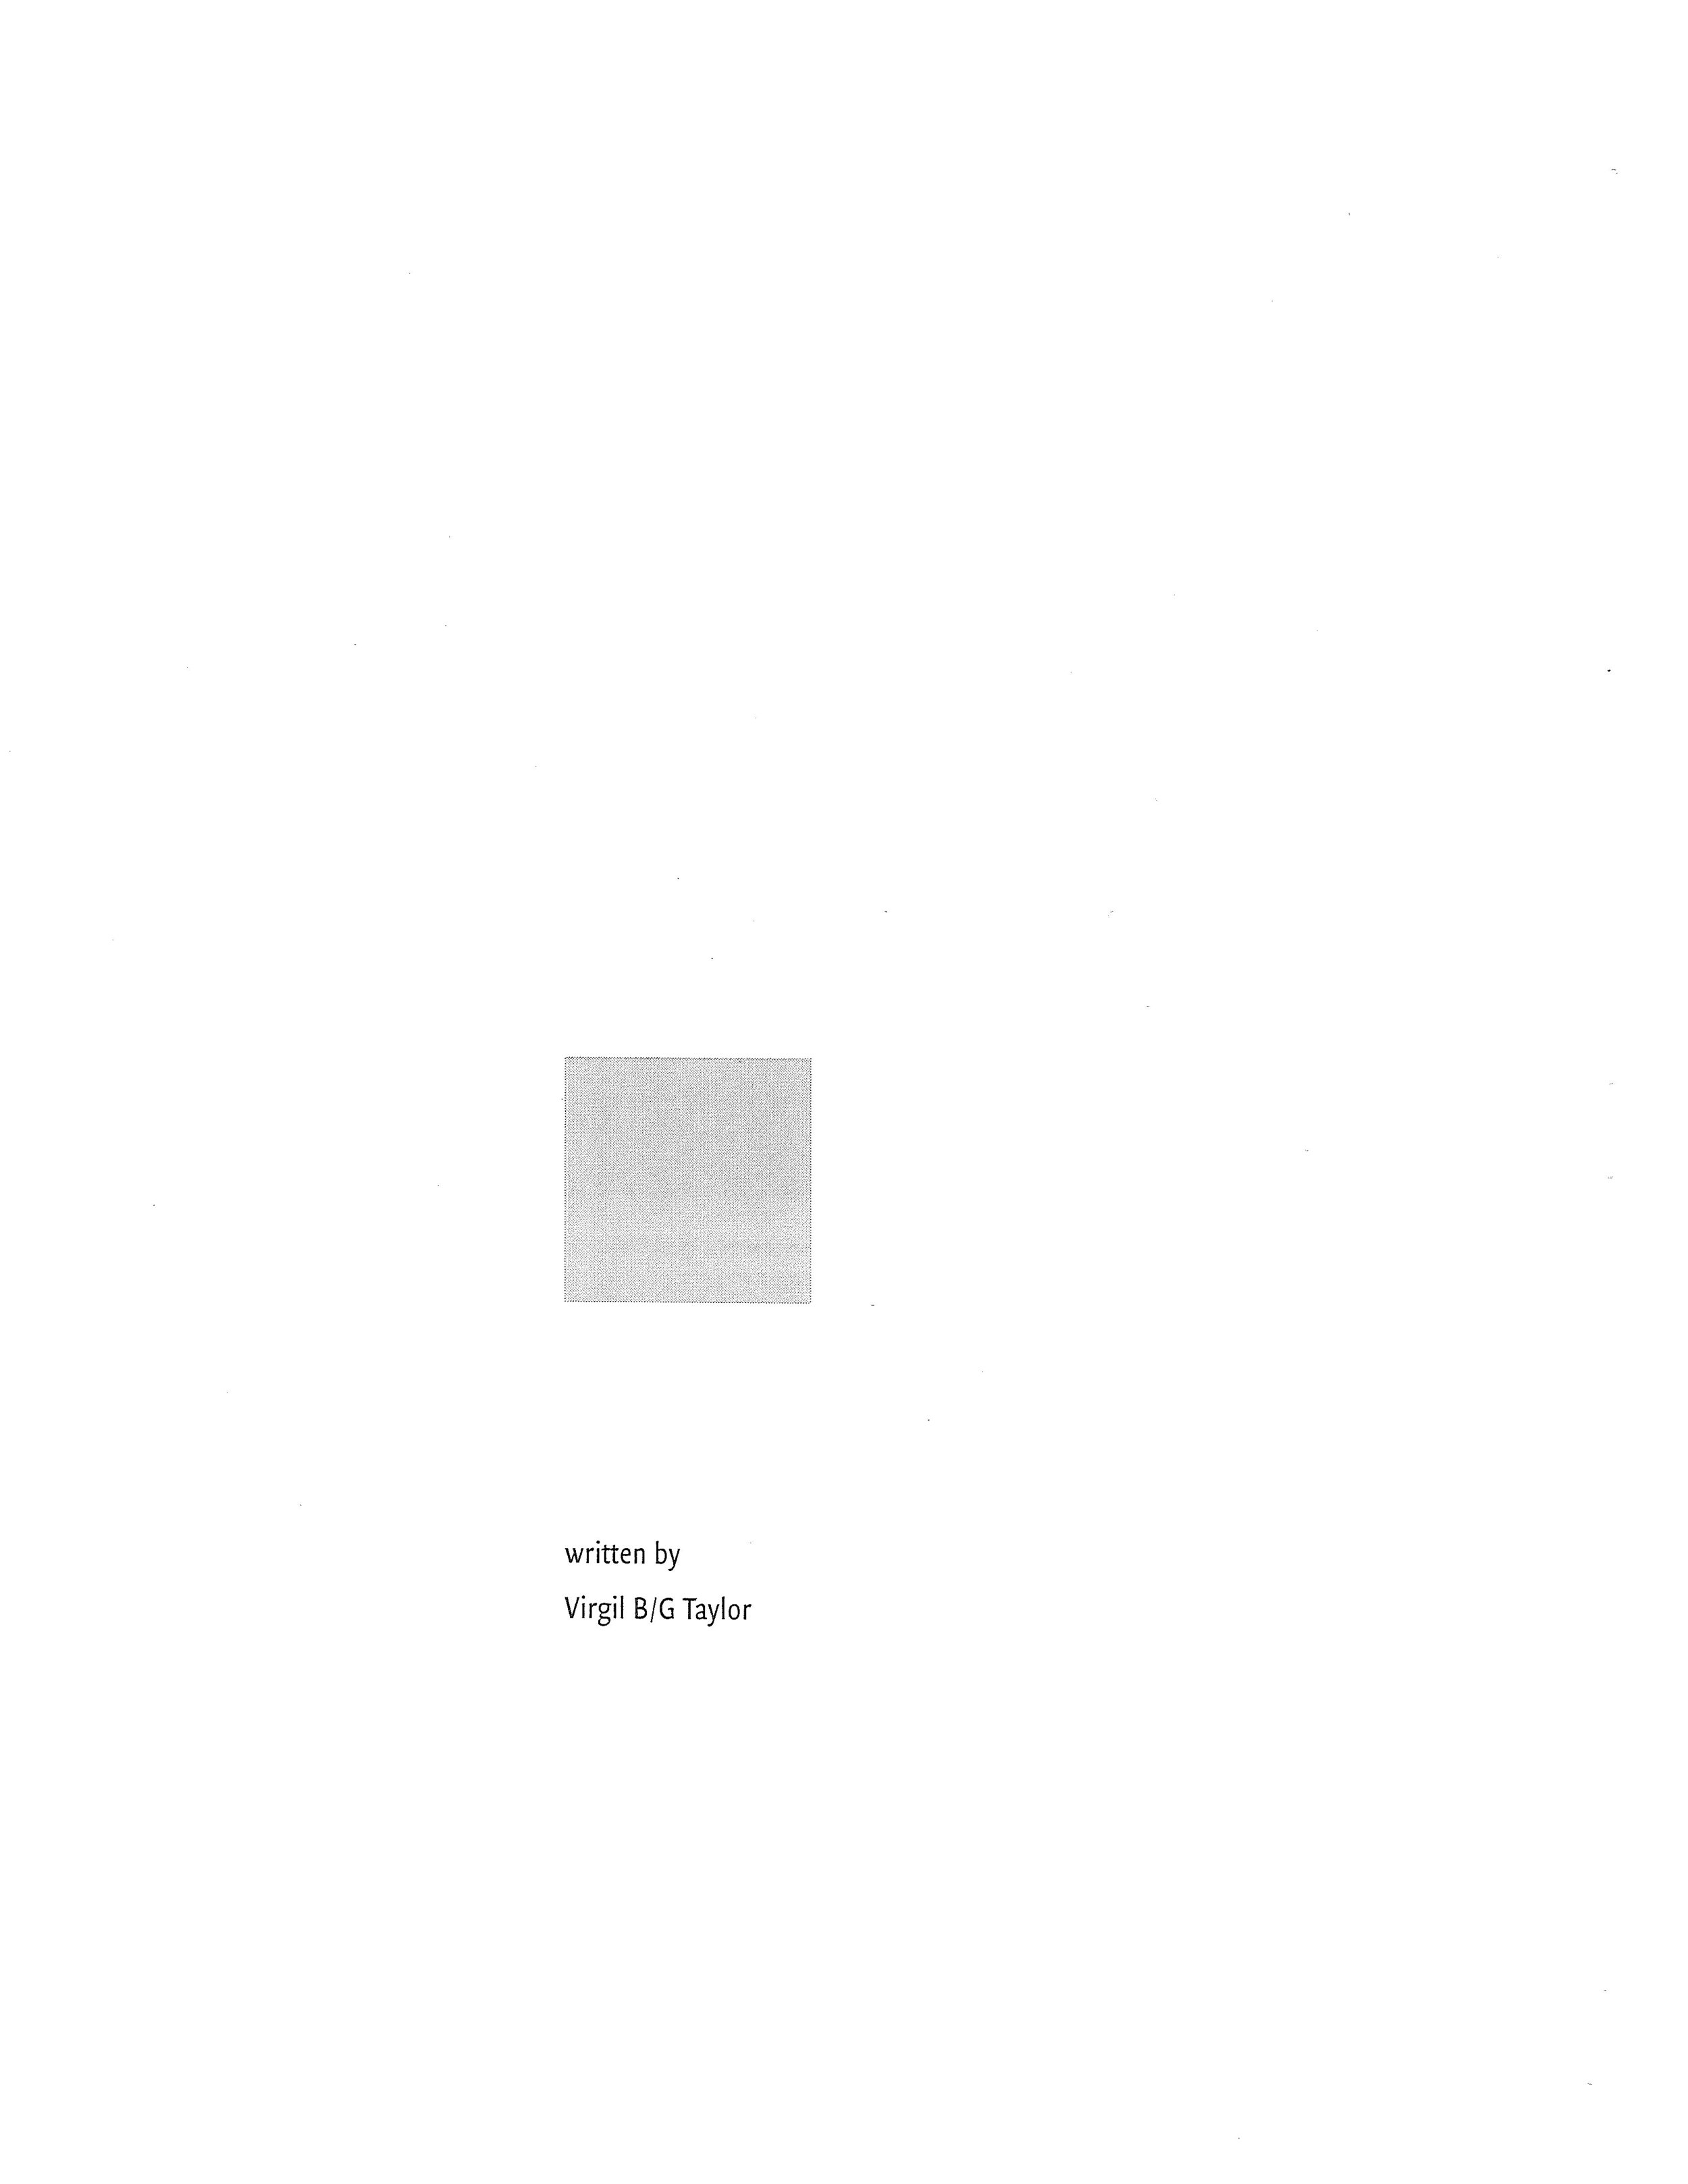 EveningWorks-Program-02.jpg